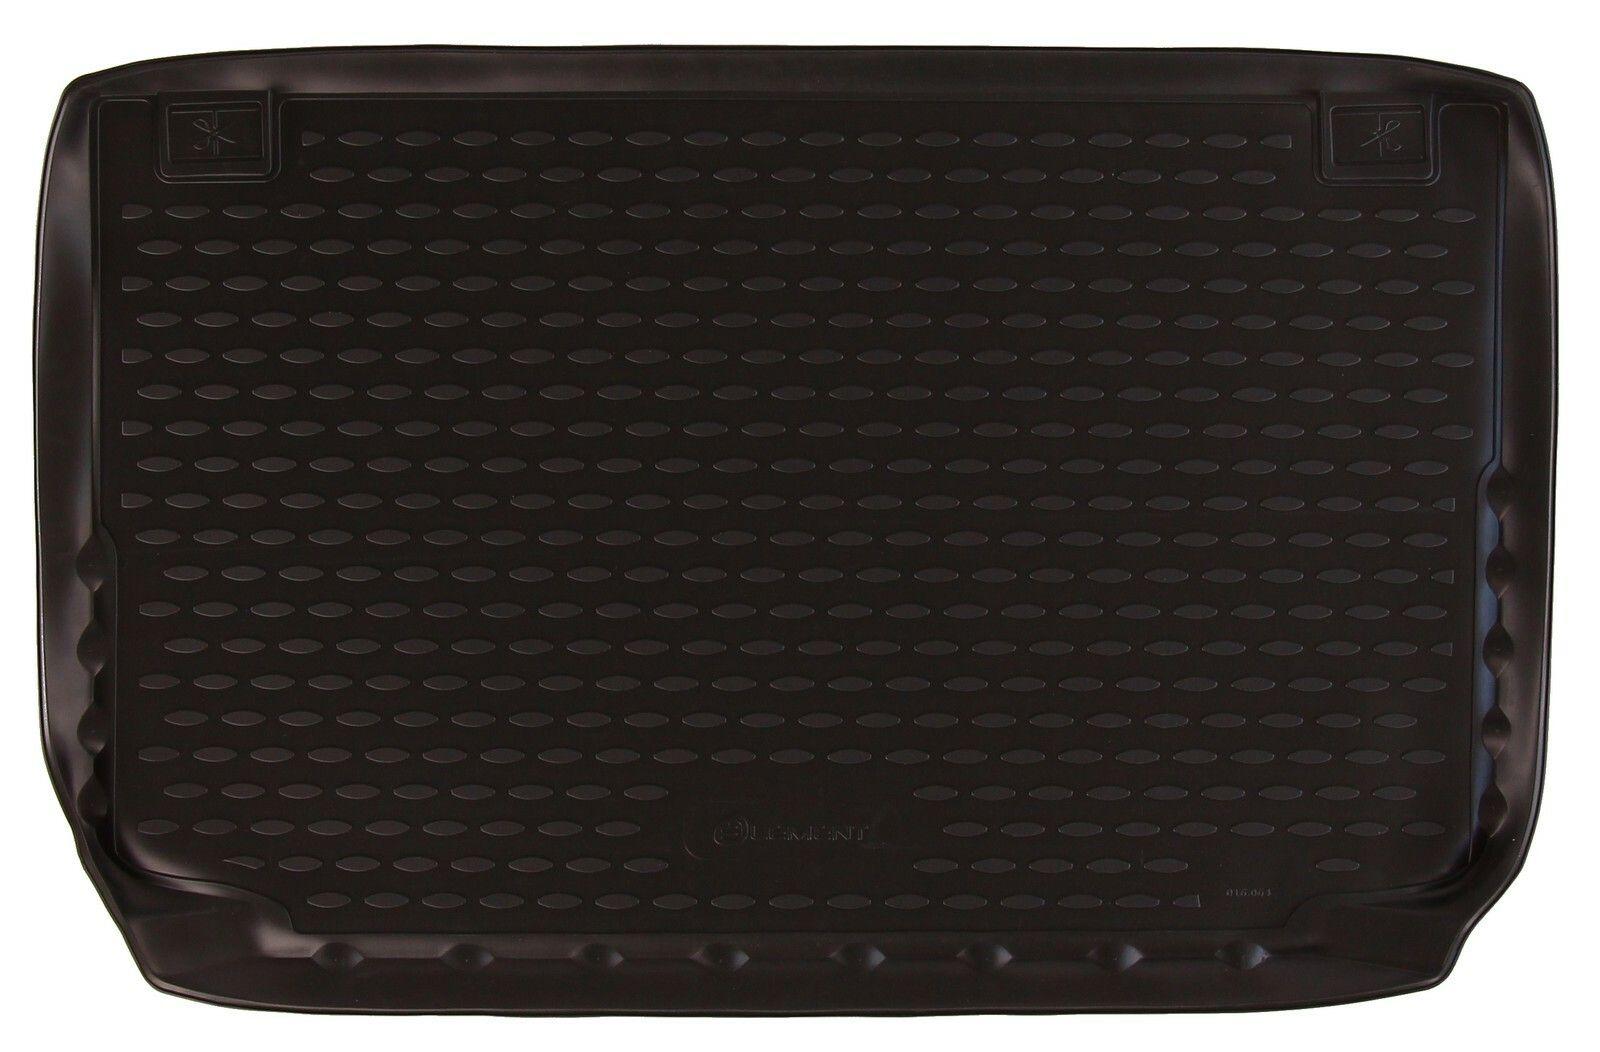 Vana do kufru gumová FORD B-max Hatchback 2012->